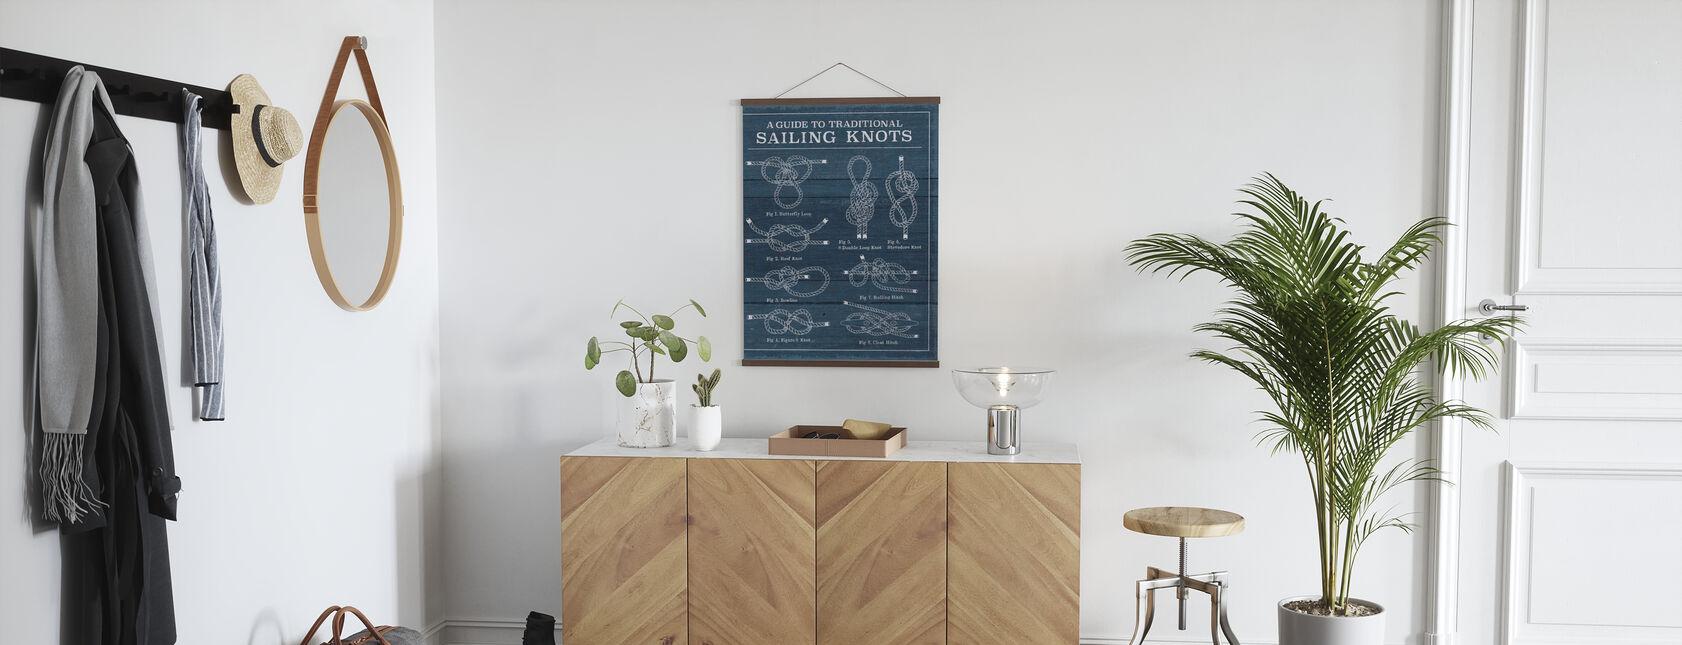 Vintage Sailing Knots - Poster - Hallway